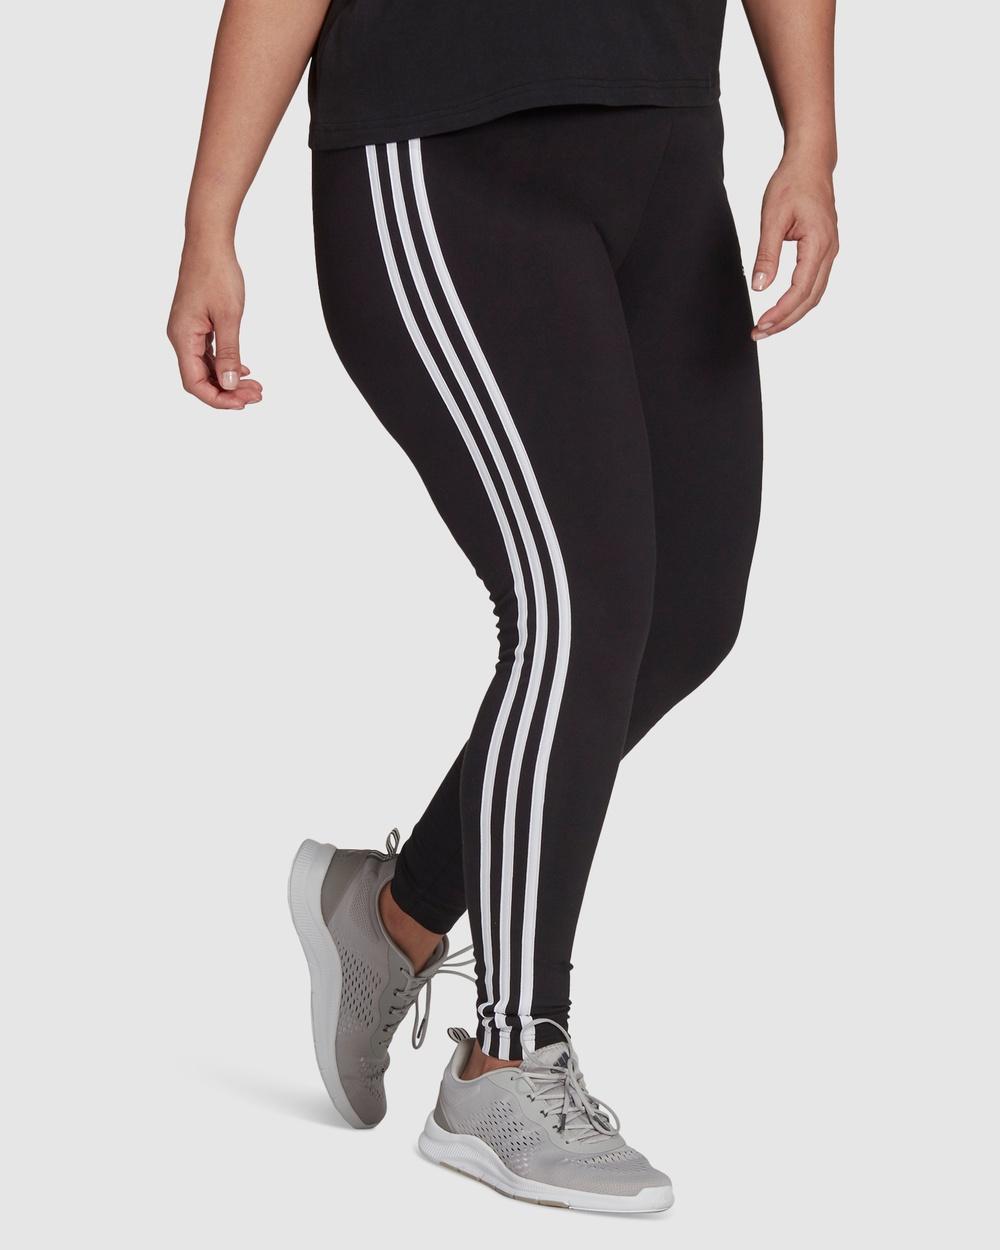 adidas Performance Essentials 3 Stripes Leggings Plus Size Sports Tights Black 3-Stripes